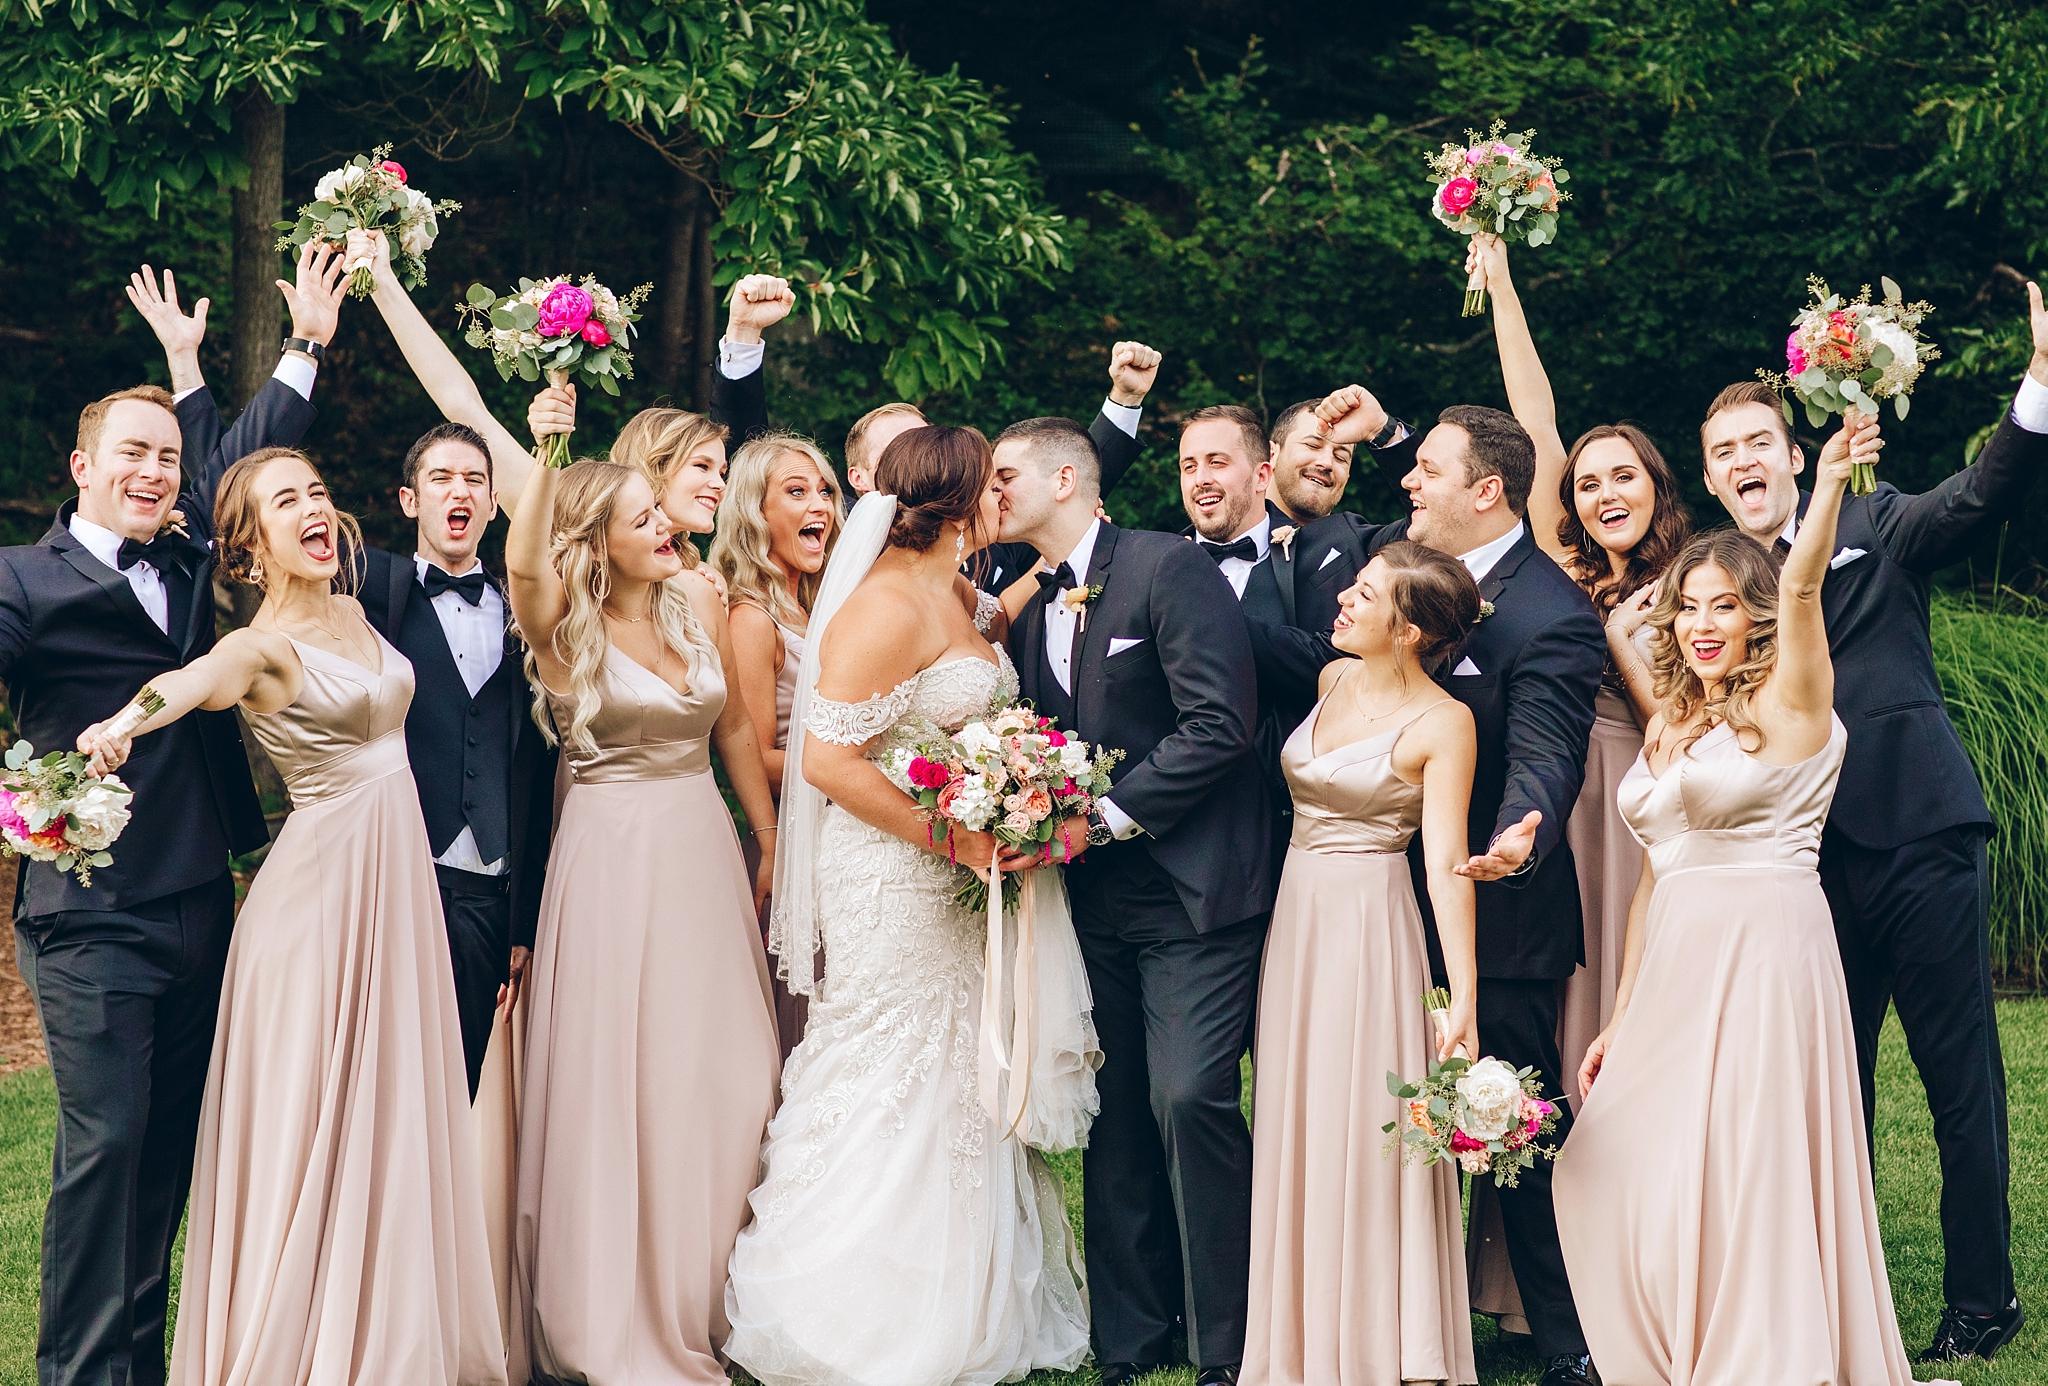 baker-lofts-holland-michigan-wedding-photographer_0367.jpg